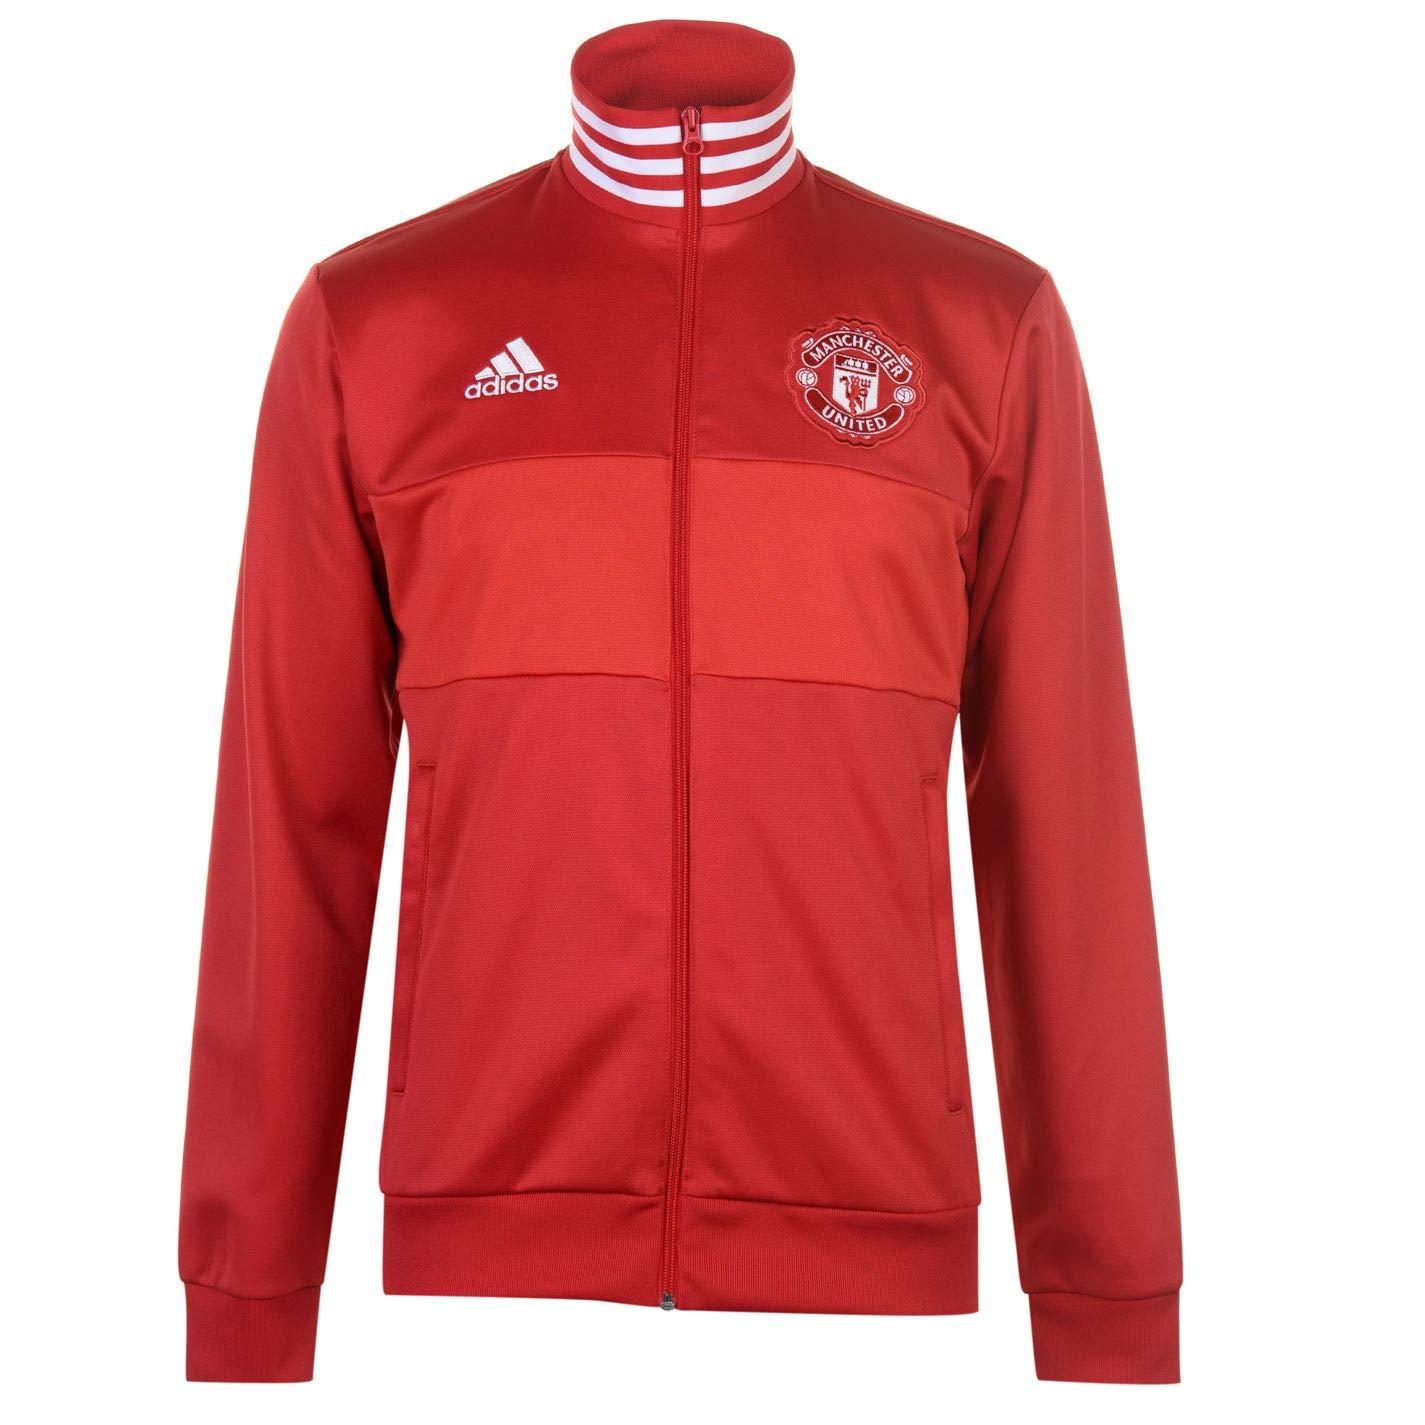 Adidas Track Herren Manchester United Jacke